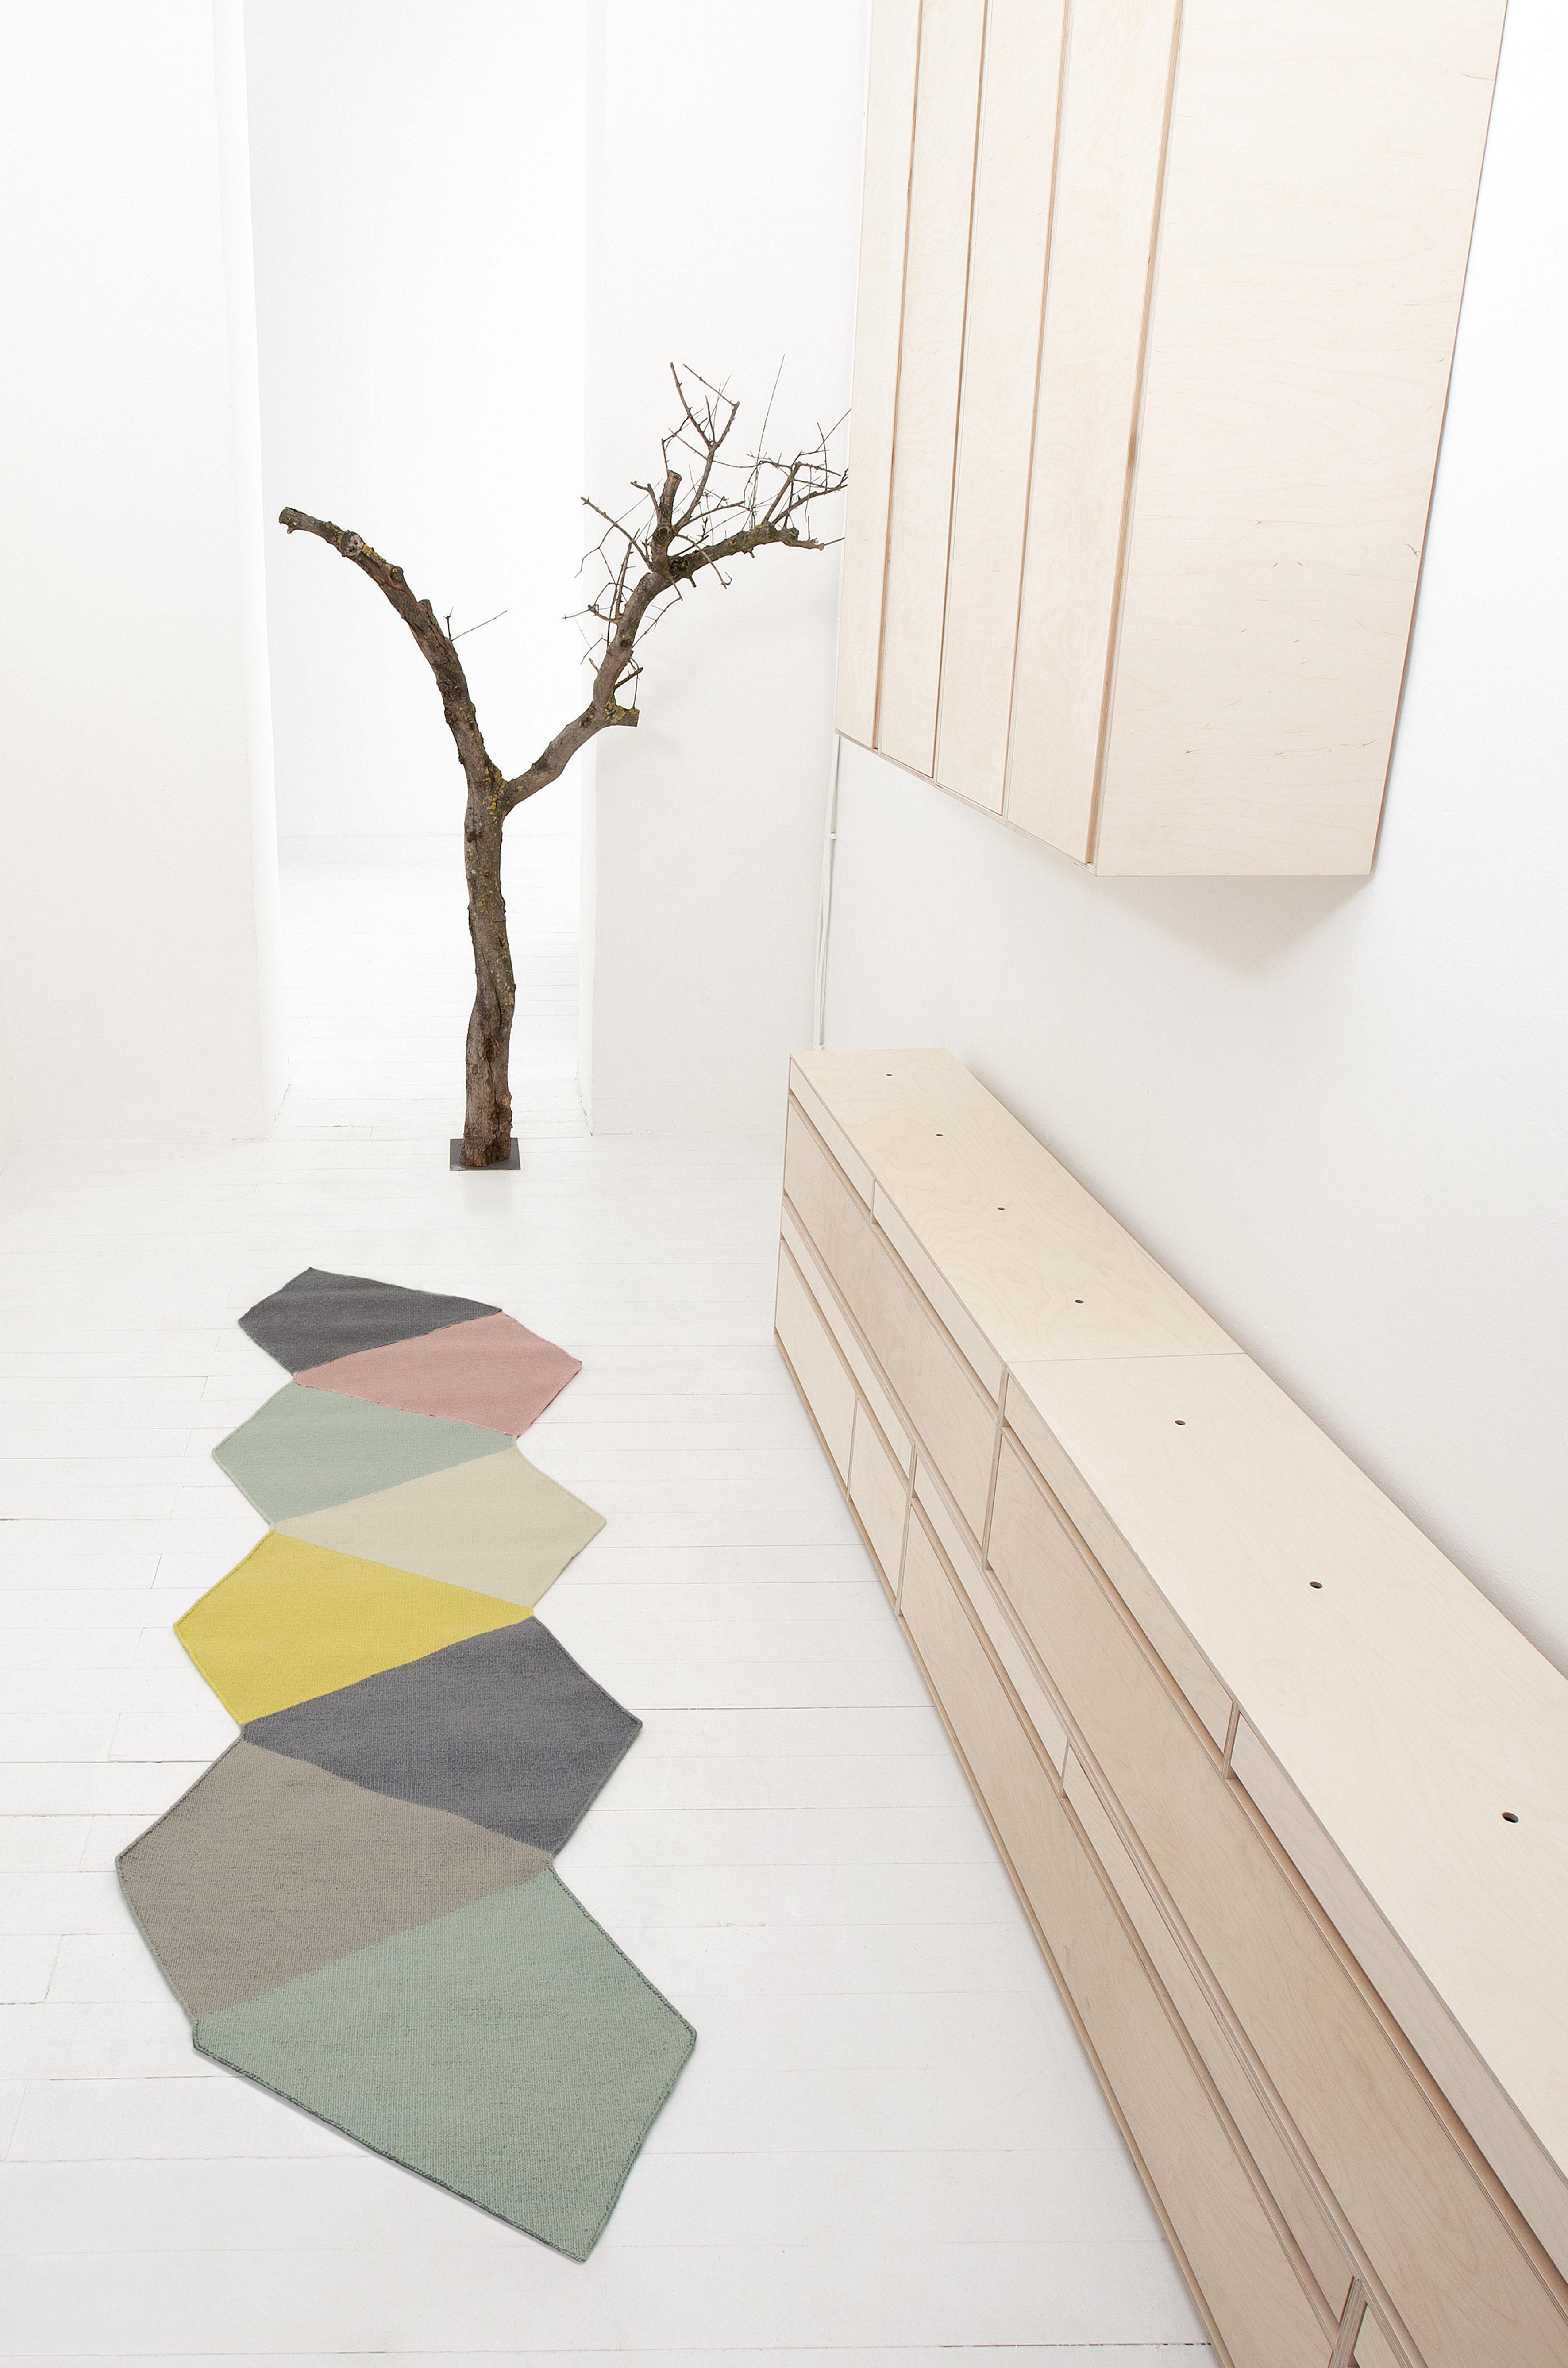 tapis crux 395 x 130 cm exclusivit web multicolore kinnasand made in design - Tapis De Couloir